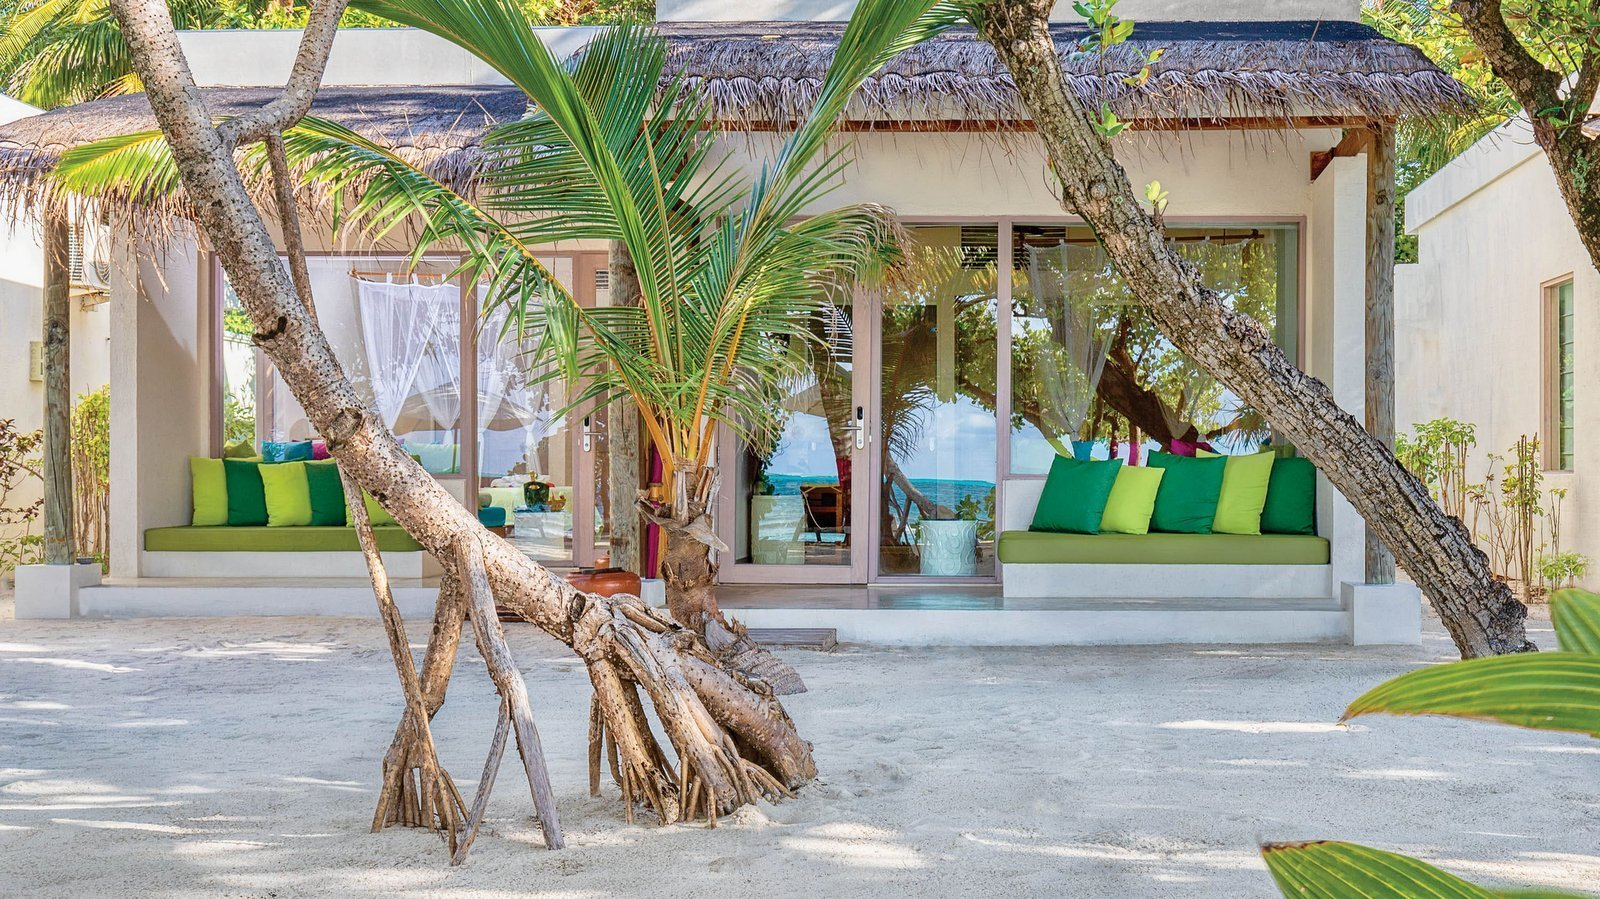 Мальдивы, отель OBLU by Atmosphere at Helengeli, номер Deluxe Beach Villa